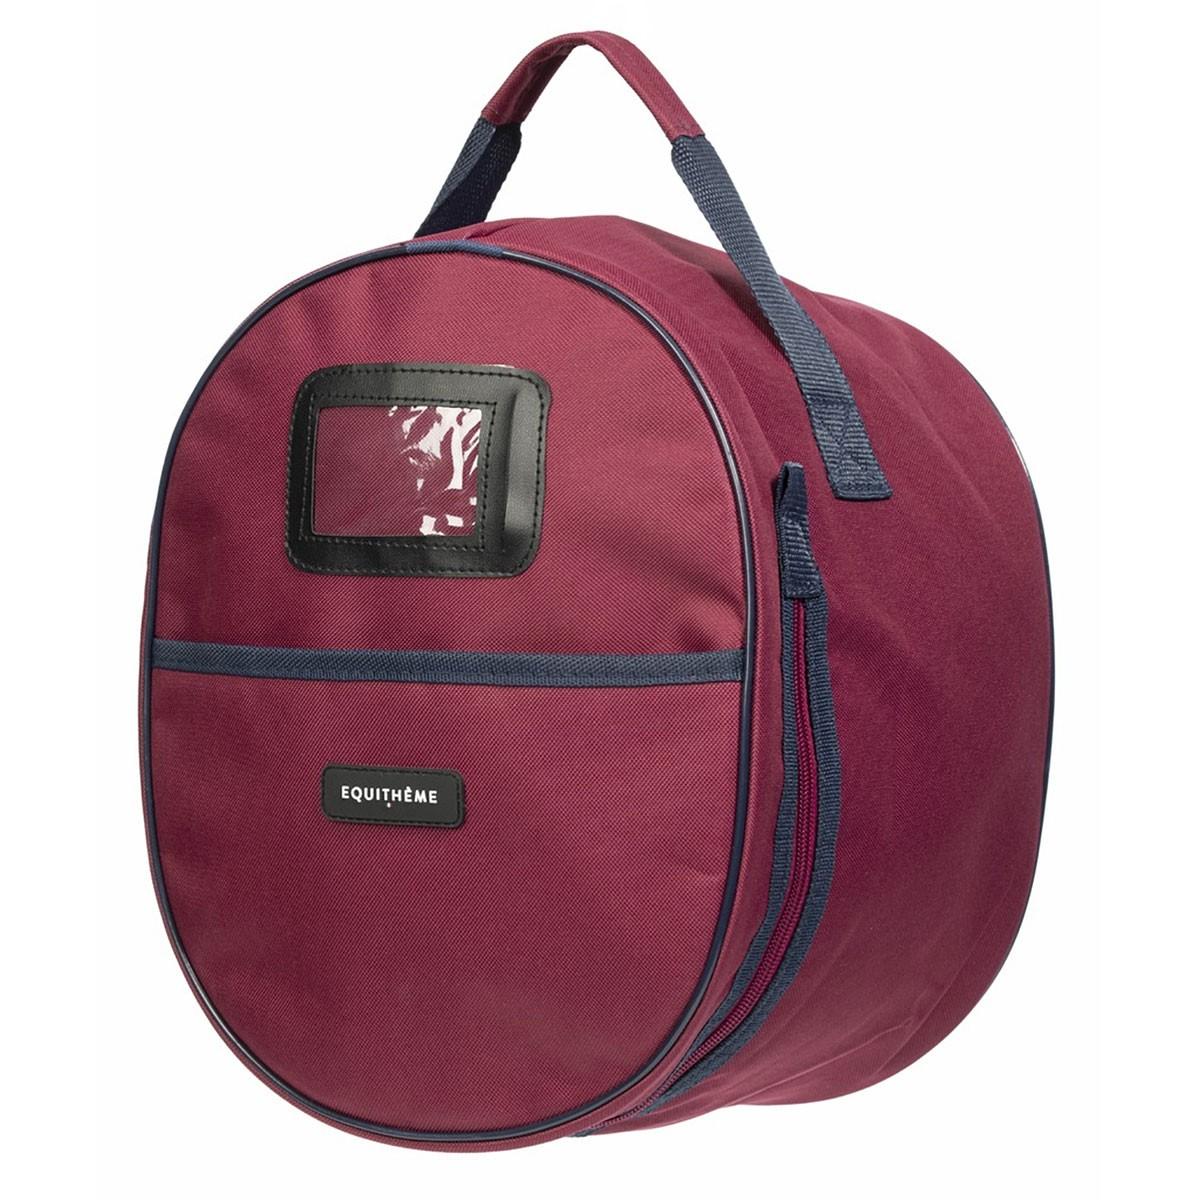 Equitheme Burgundy/Navy Helmet Bag